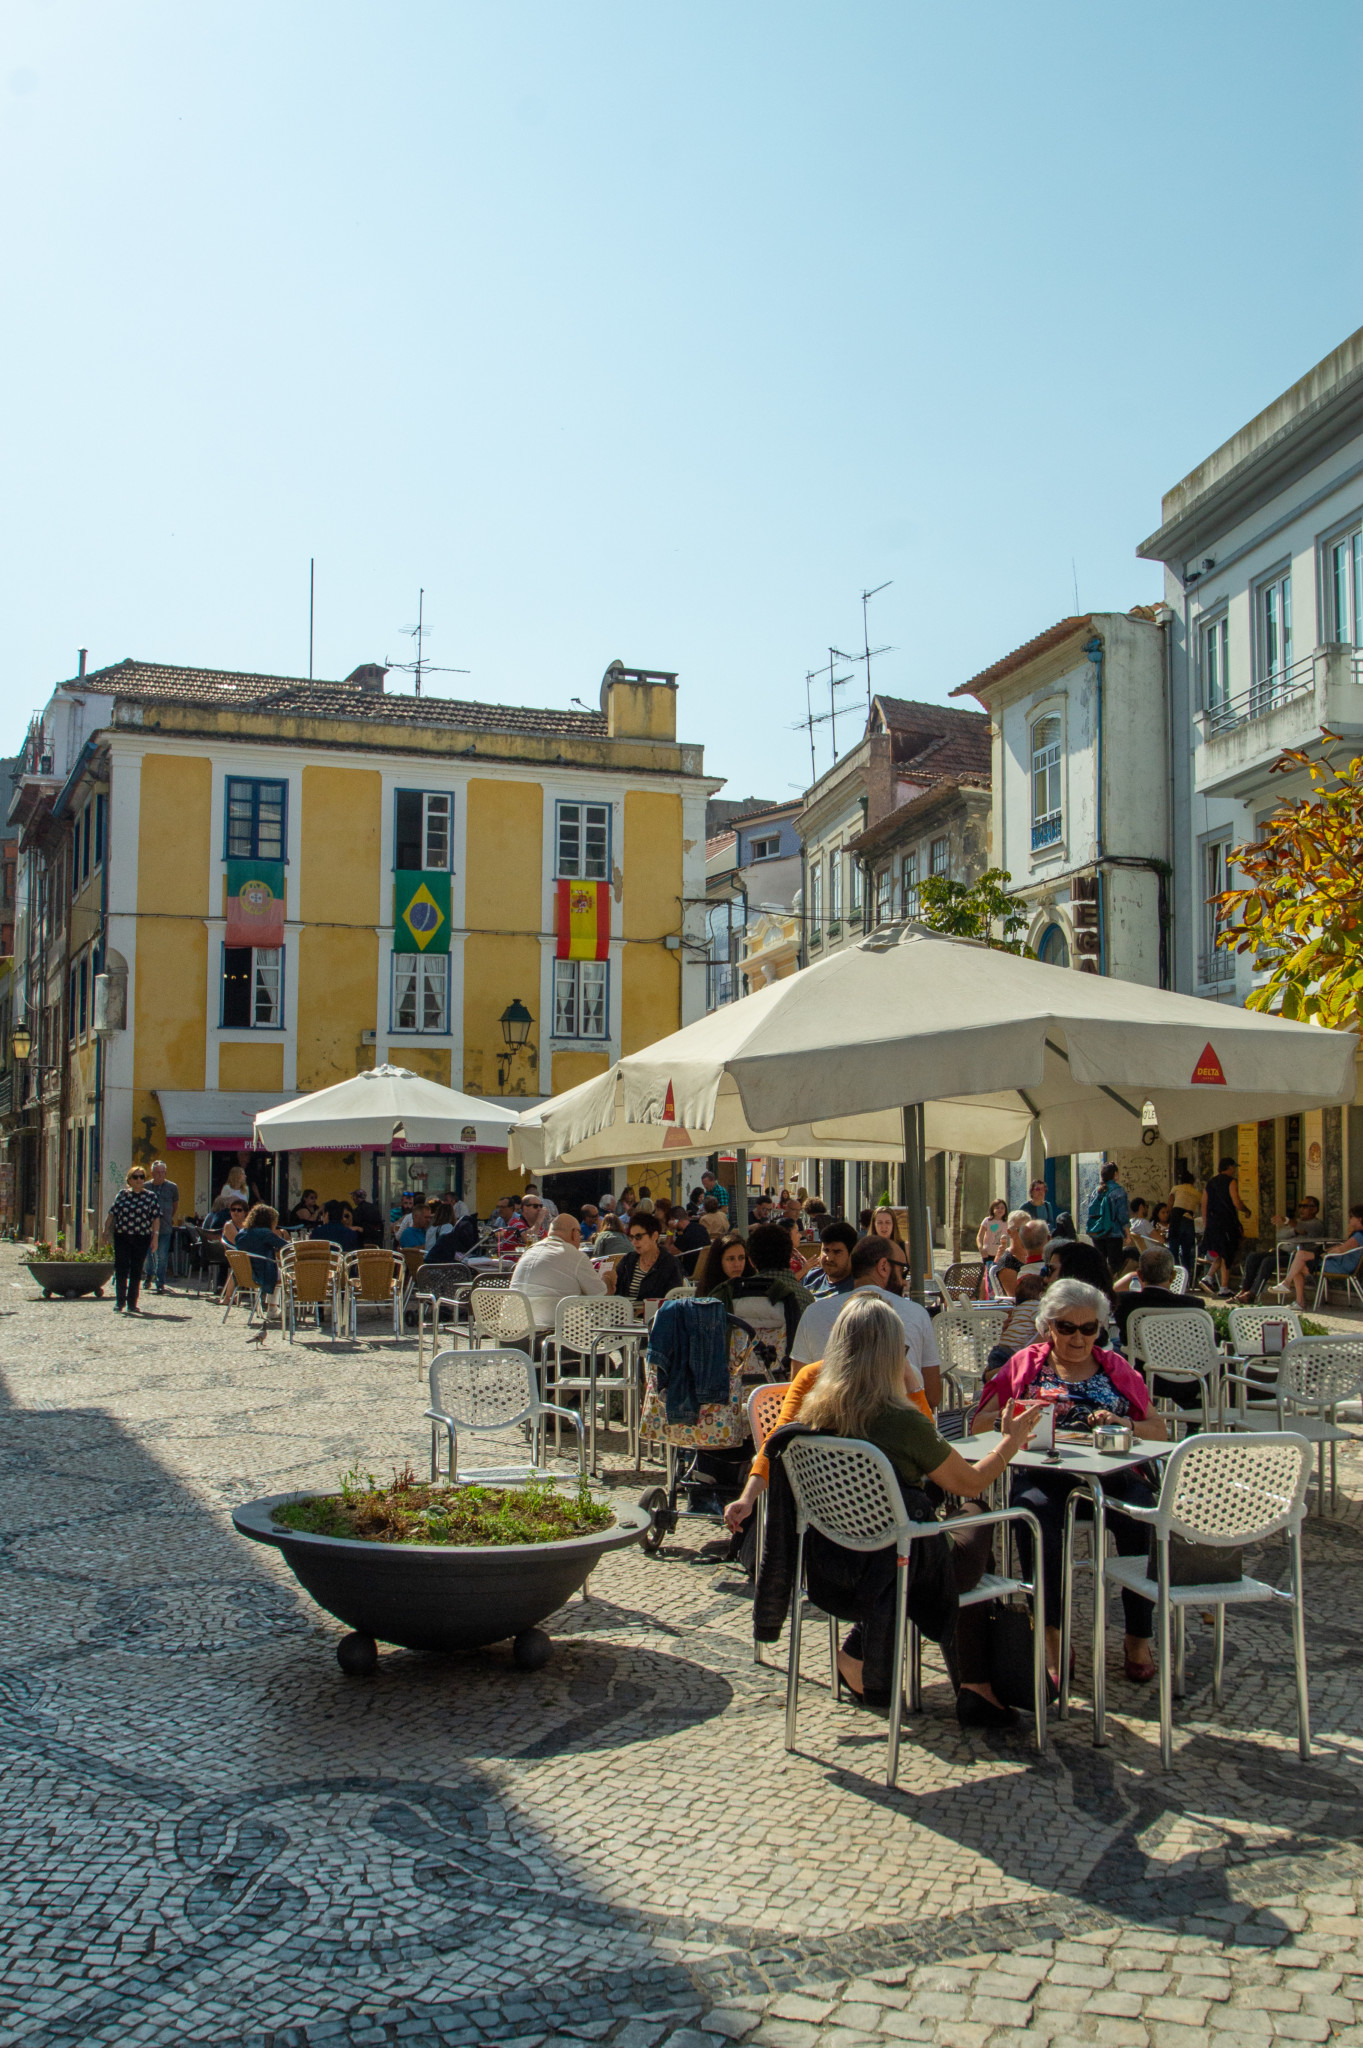 Marktgeschehen in Aveiro